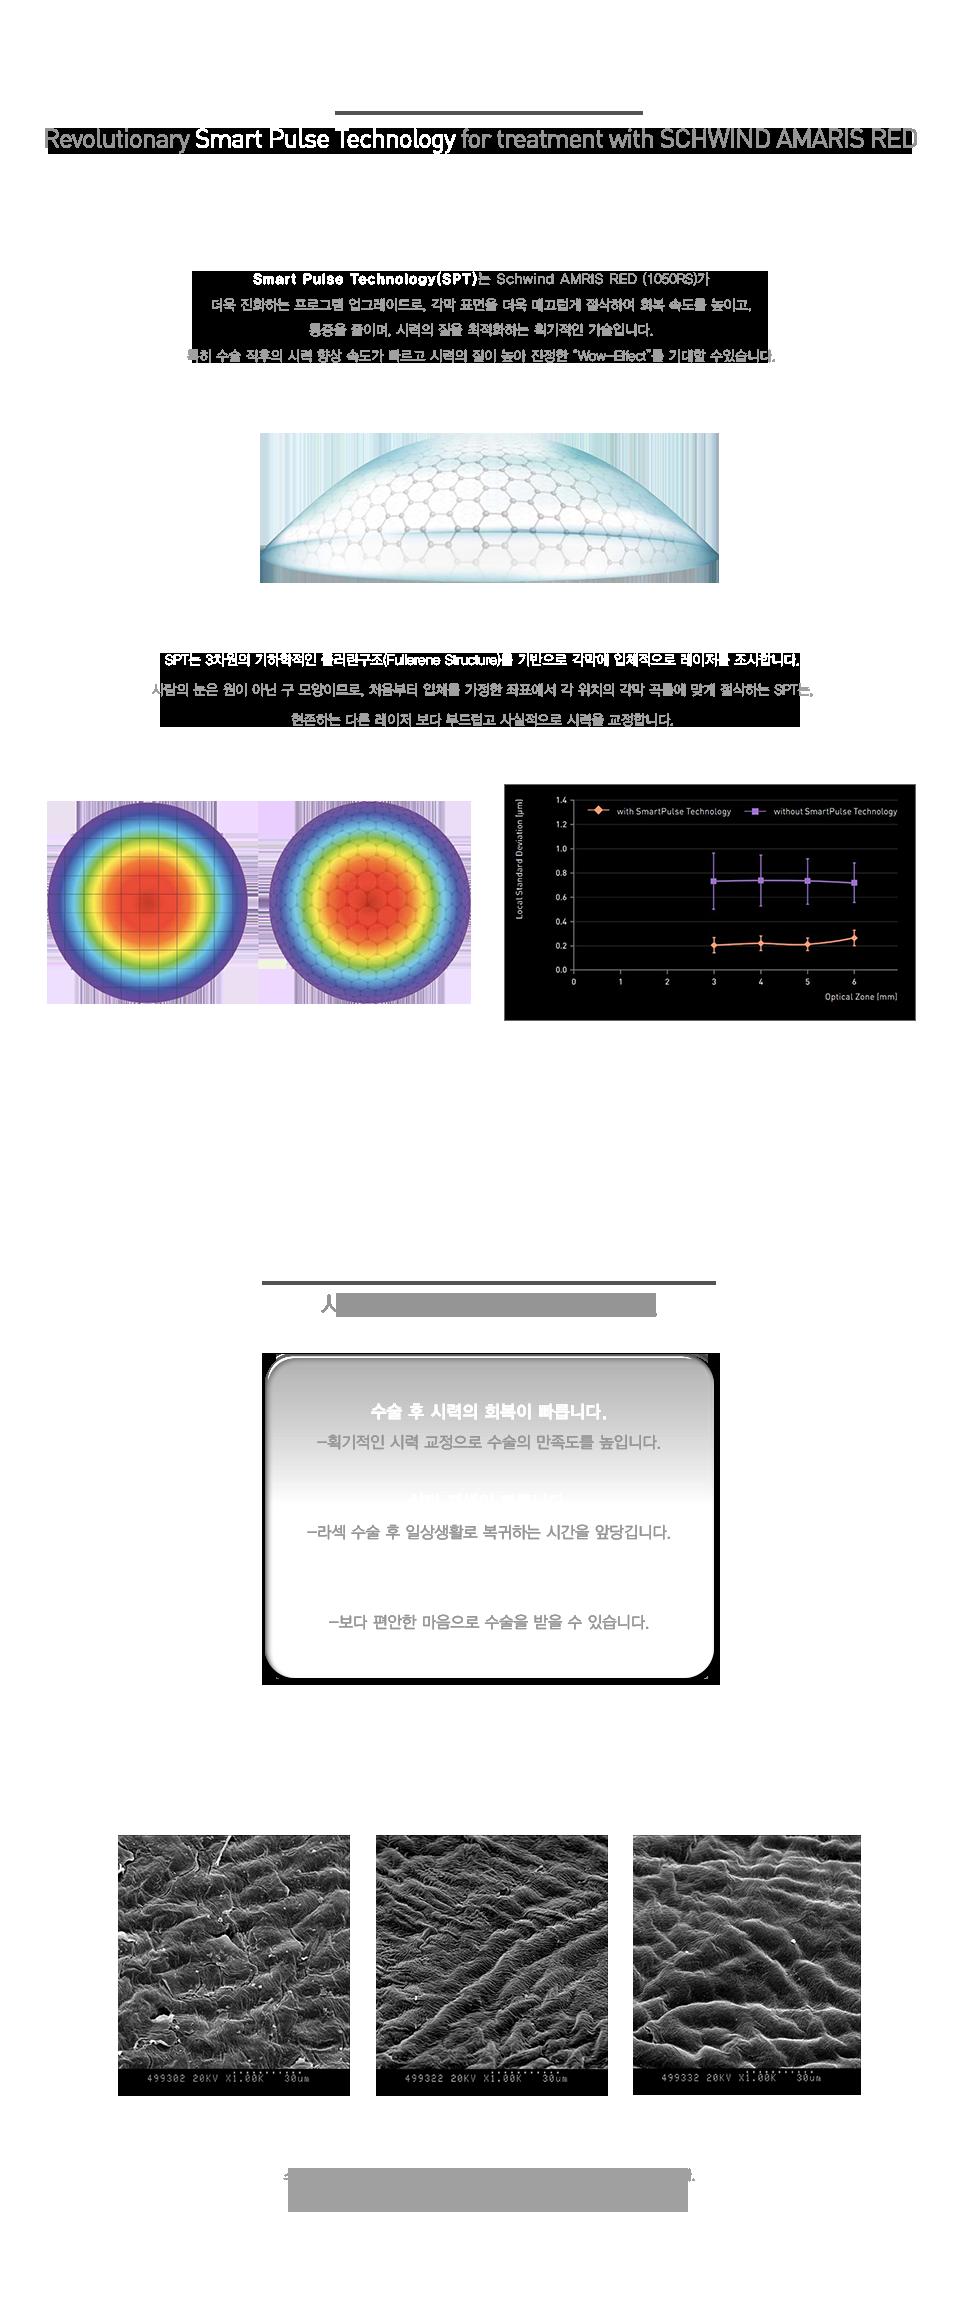 smartpurse-2.png